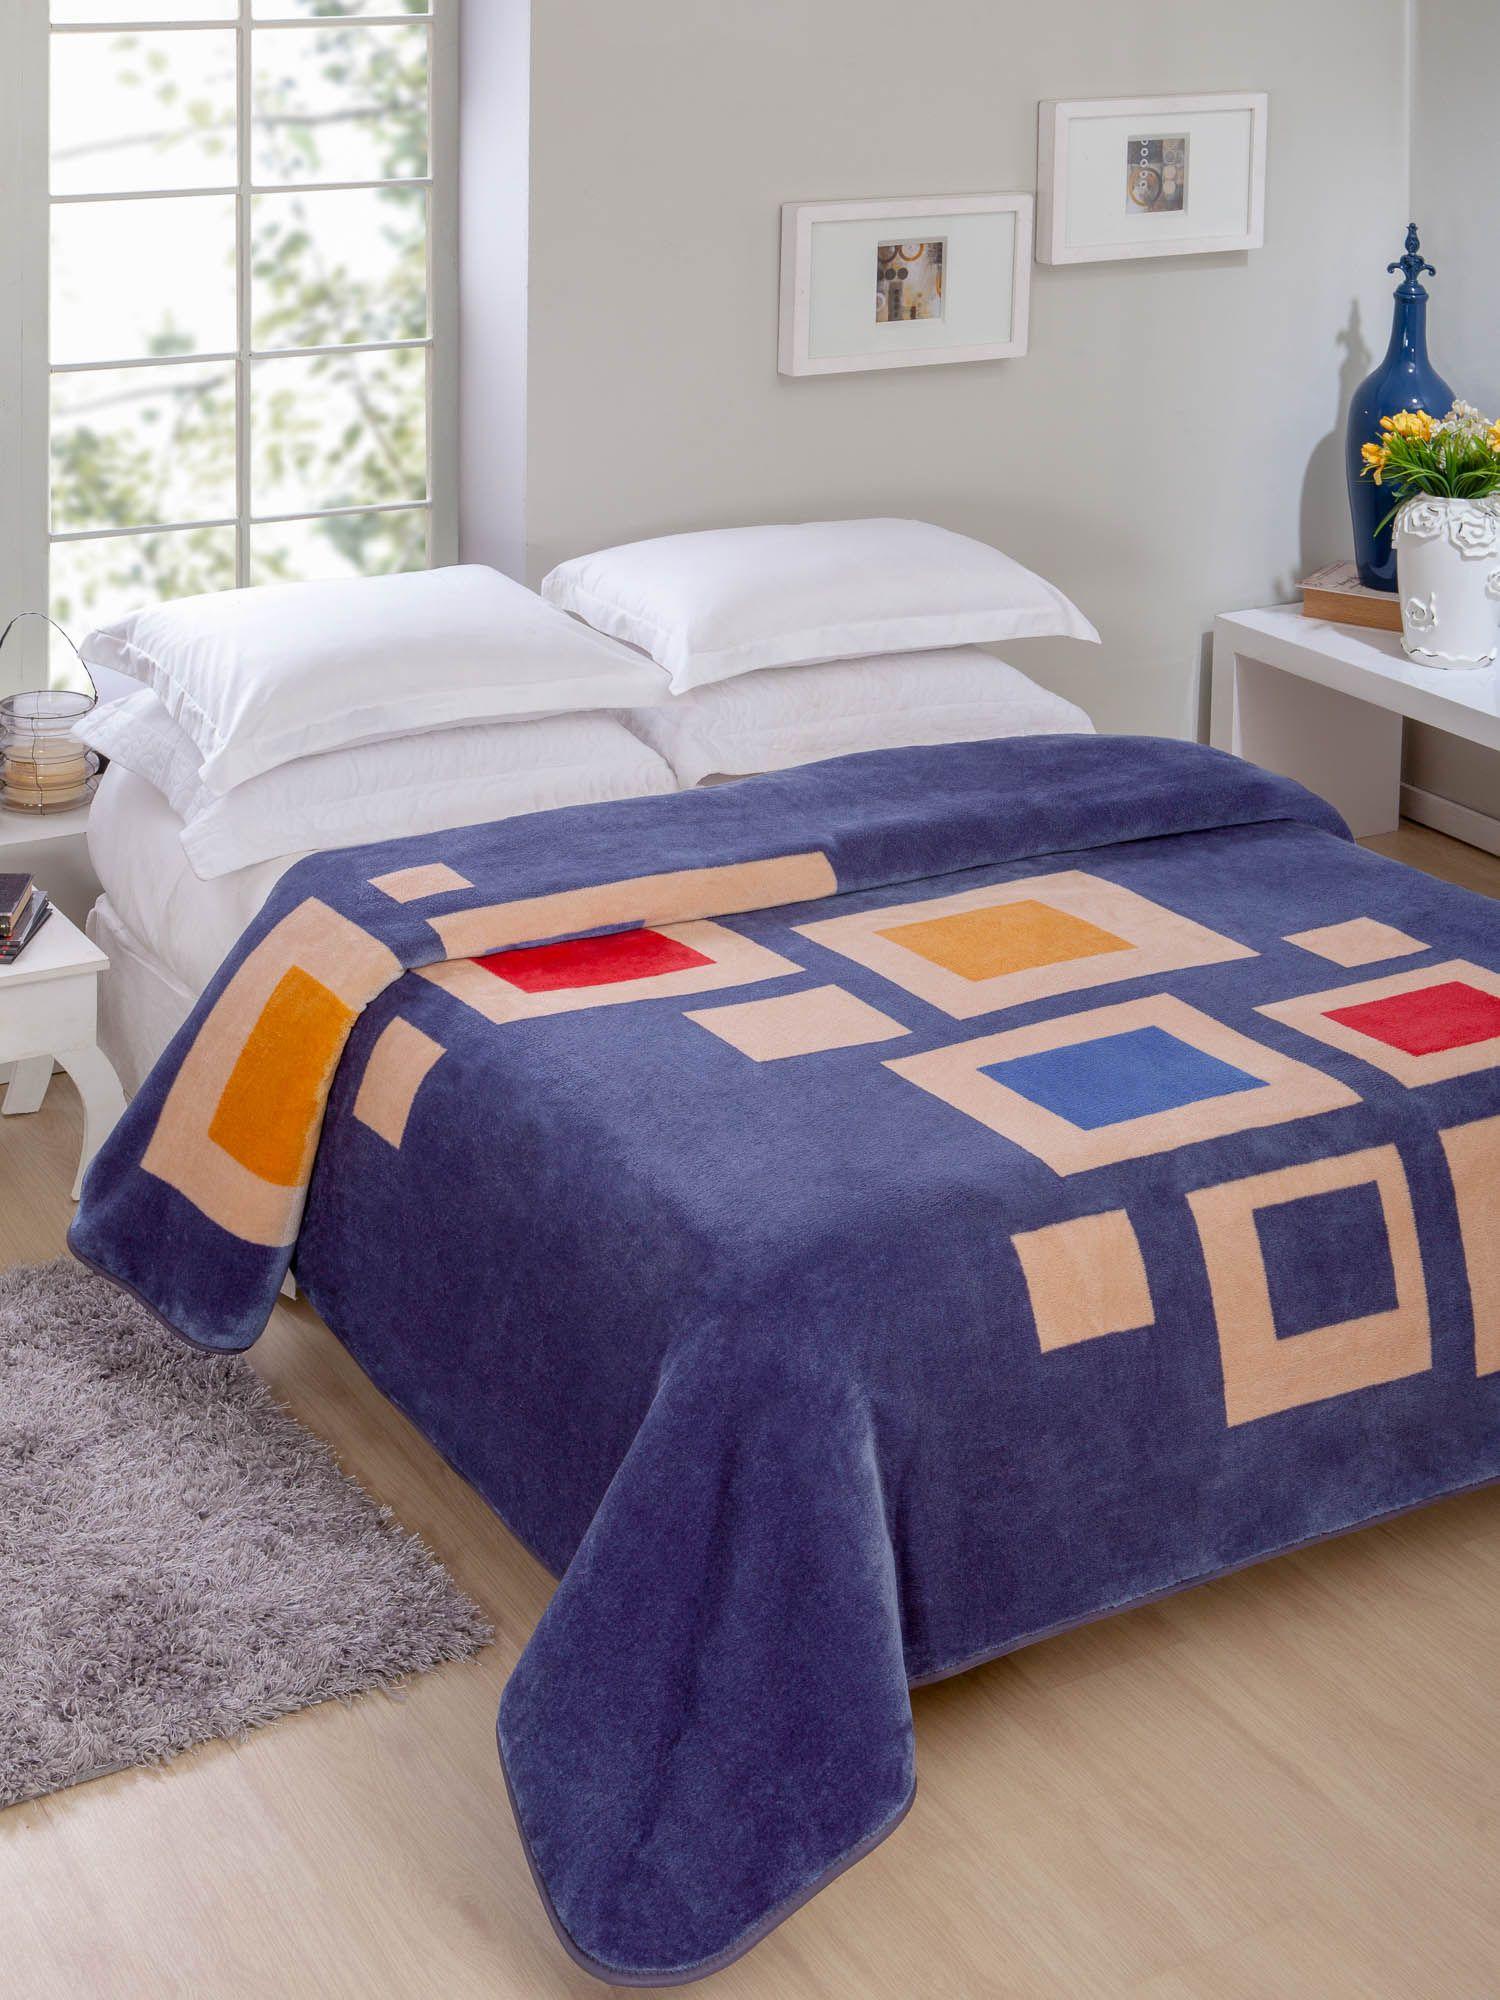 Cobertor Não Alérgico Jolitex Raschel Dakota Casal 1,80 m x 2,20 m